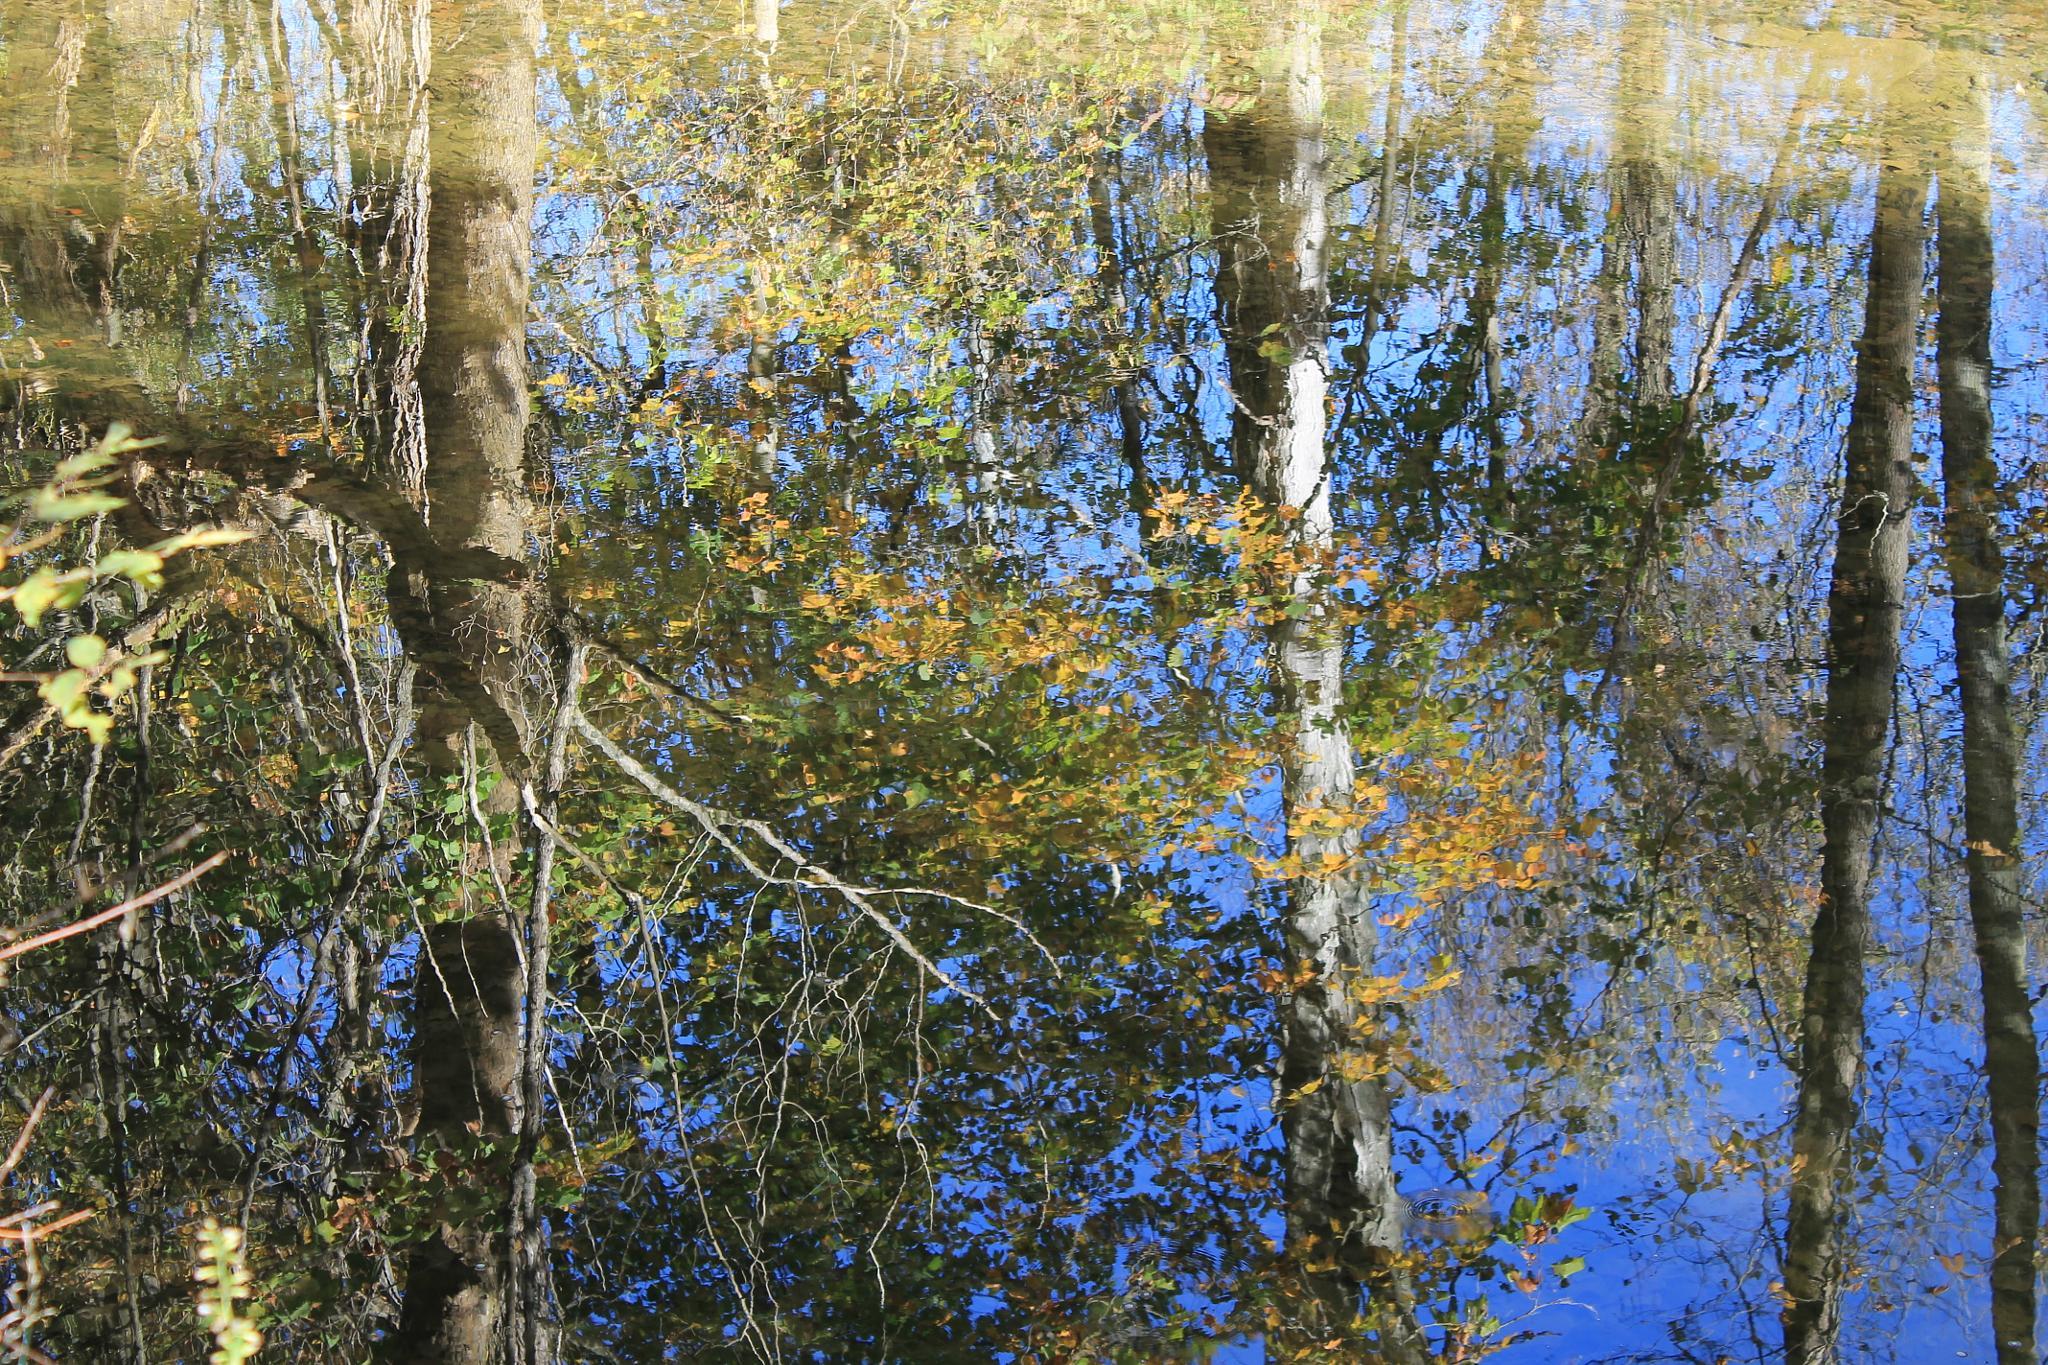 Reflections on Oatka by George Sander